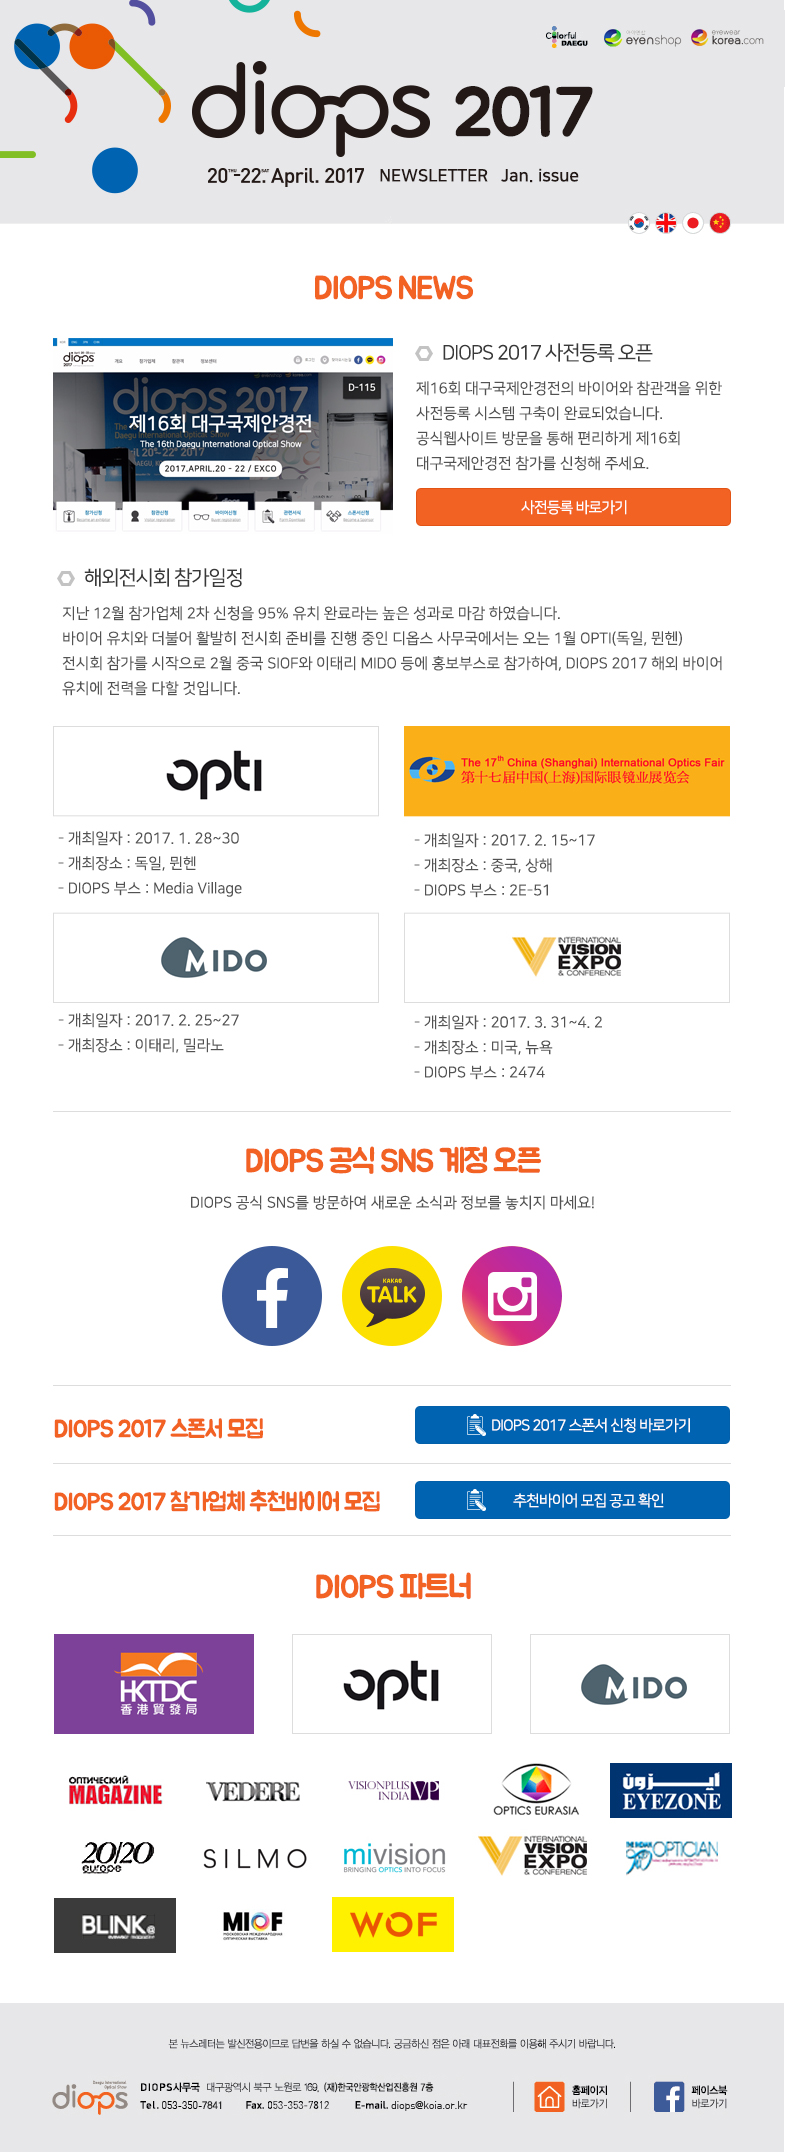 diops1701_kor.jpg